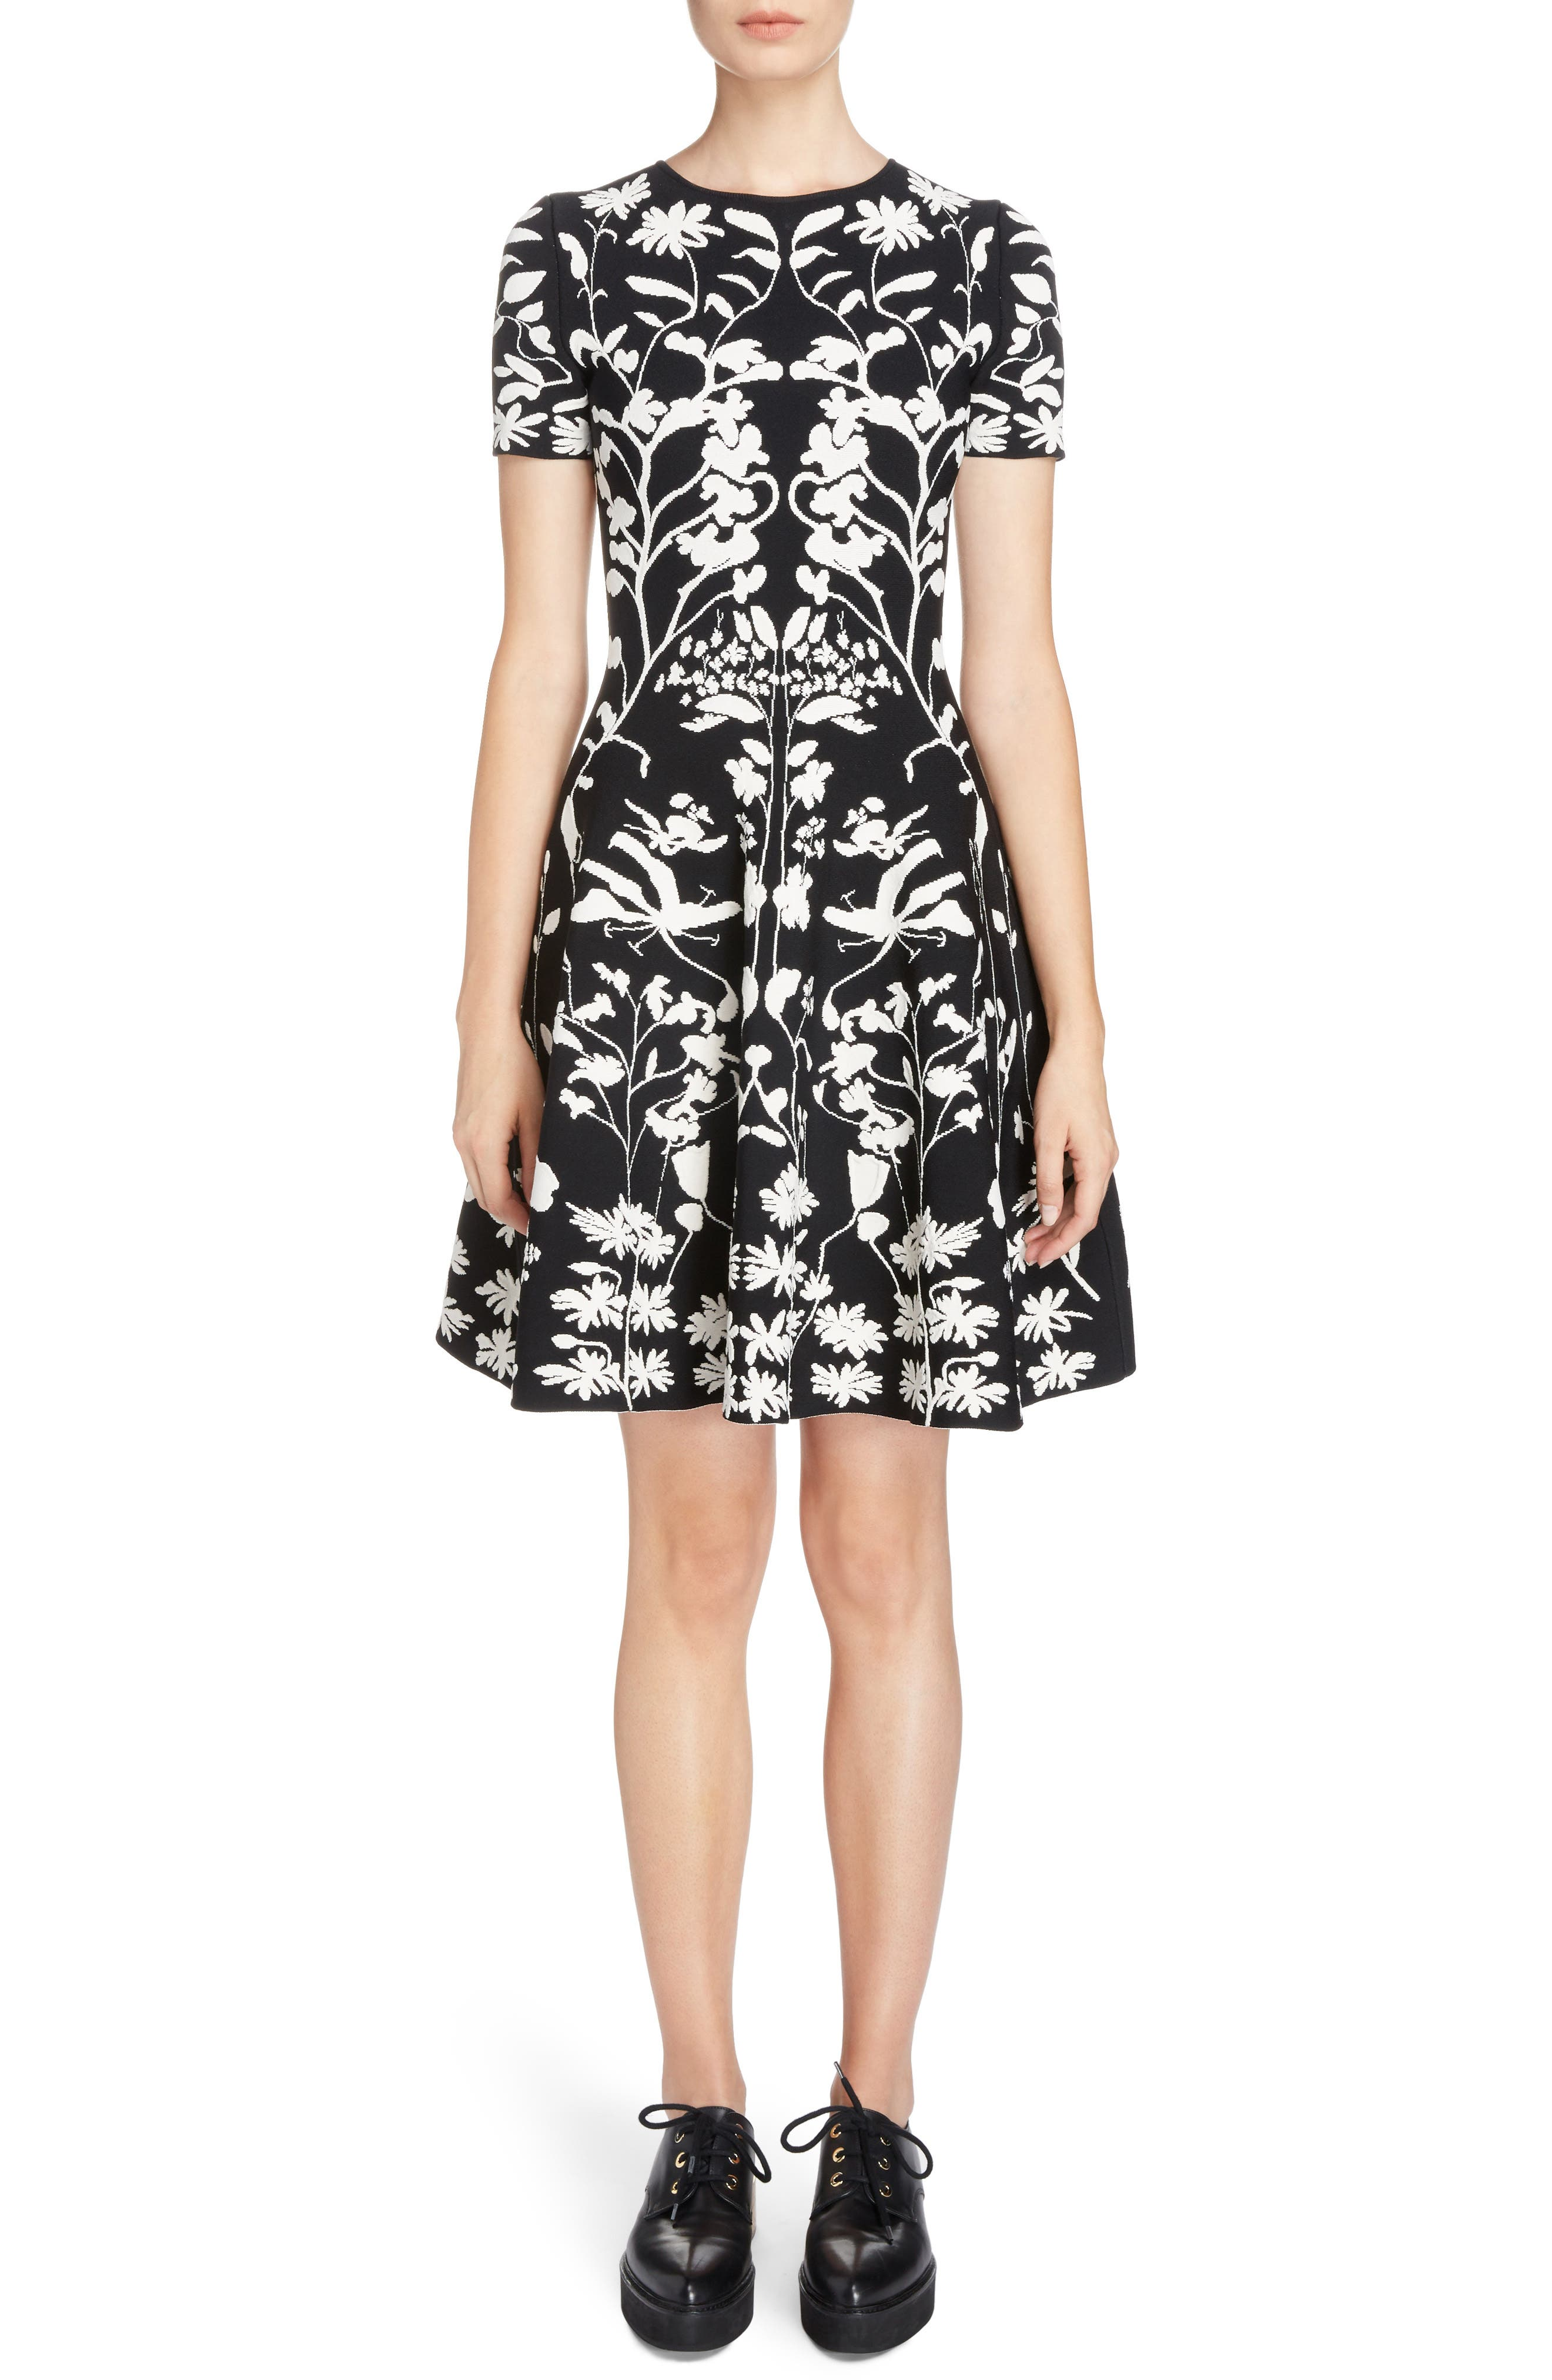 Botanical Jacquard Knit Flounce Dress,                         Main,                         color, Black/ Ivory